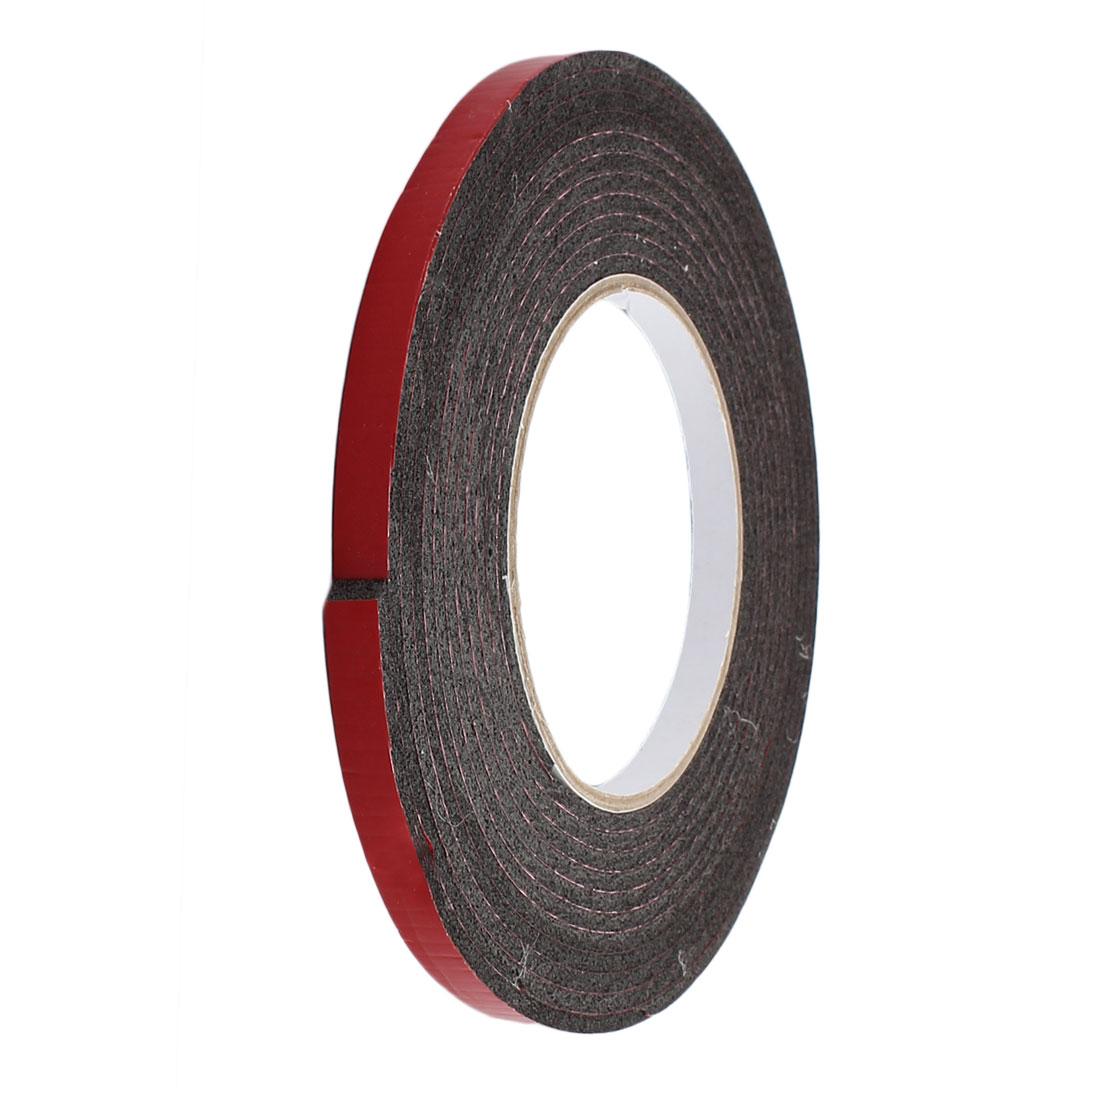 8mm x 3mm Single Sided Self Adhesive Shockproof Sponge Foam Tape 5M Length Red